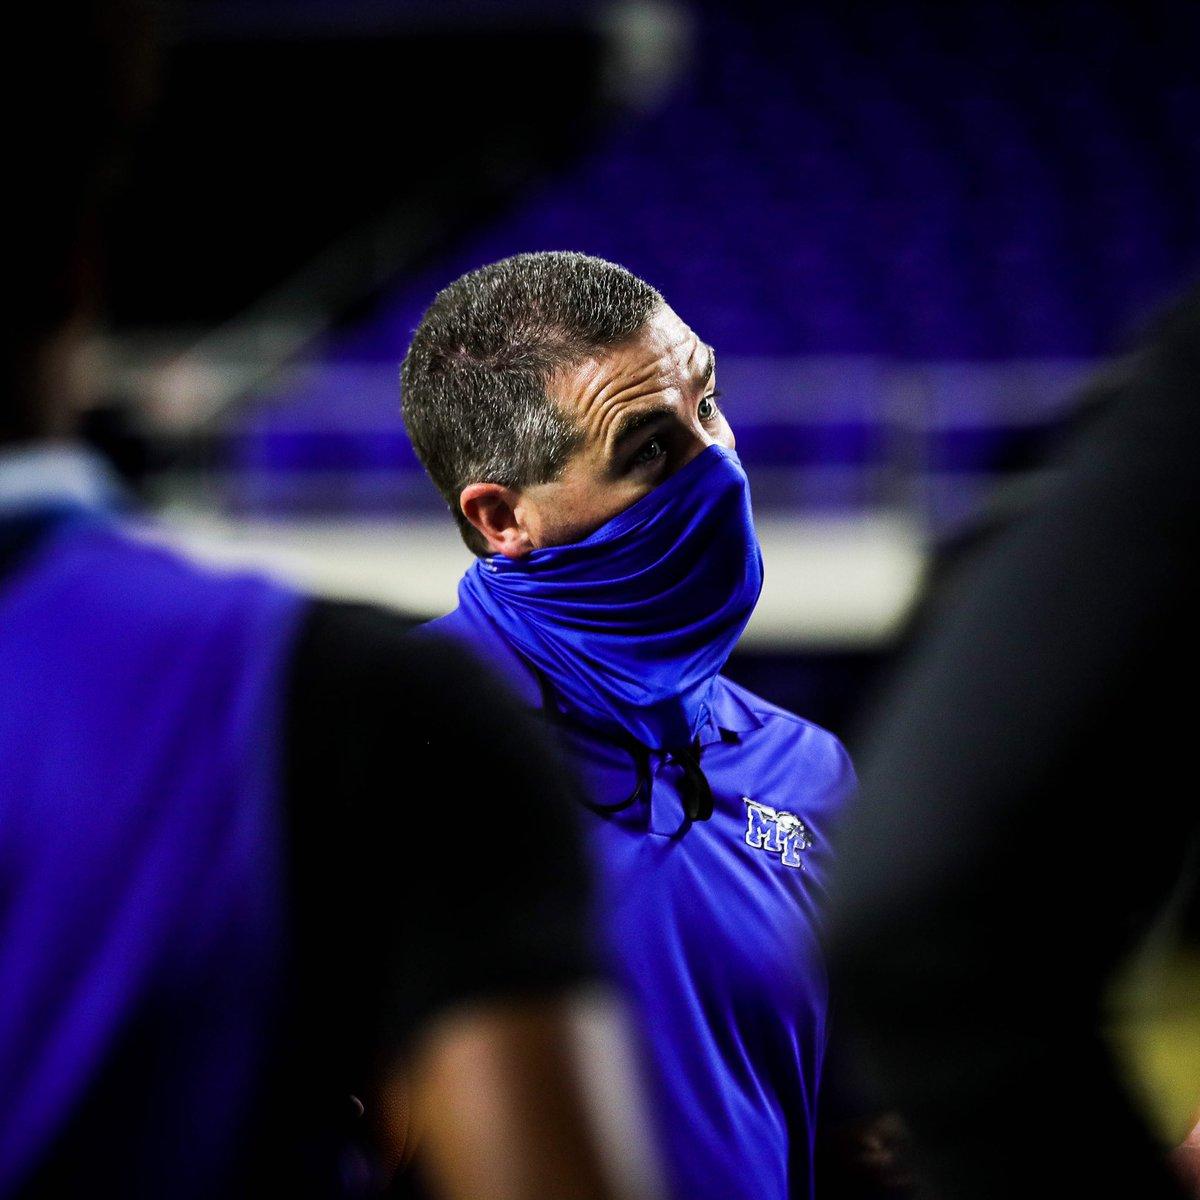 1️⃣ Mask up 2️⃣ Coach 'em up  #BlueRaiders 🔵⚪️⚡️ https://t.co/gA9QEWNqhe